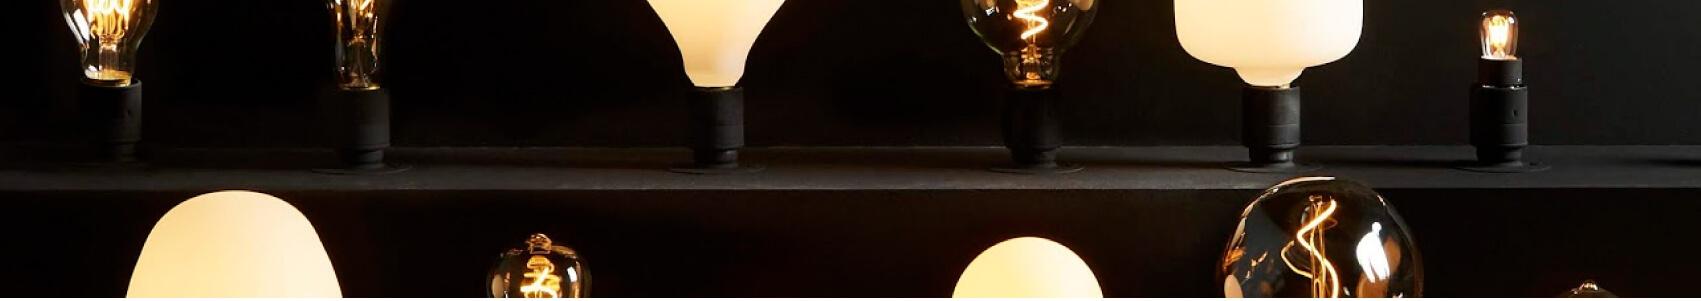 Bulbs & Fittings